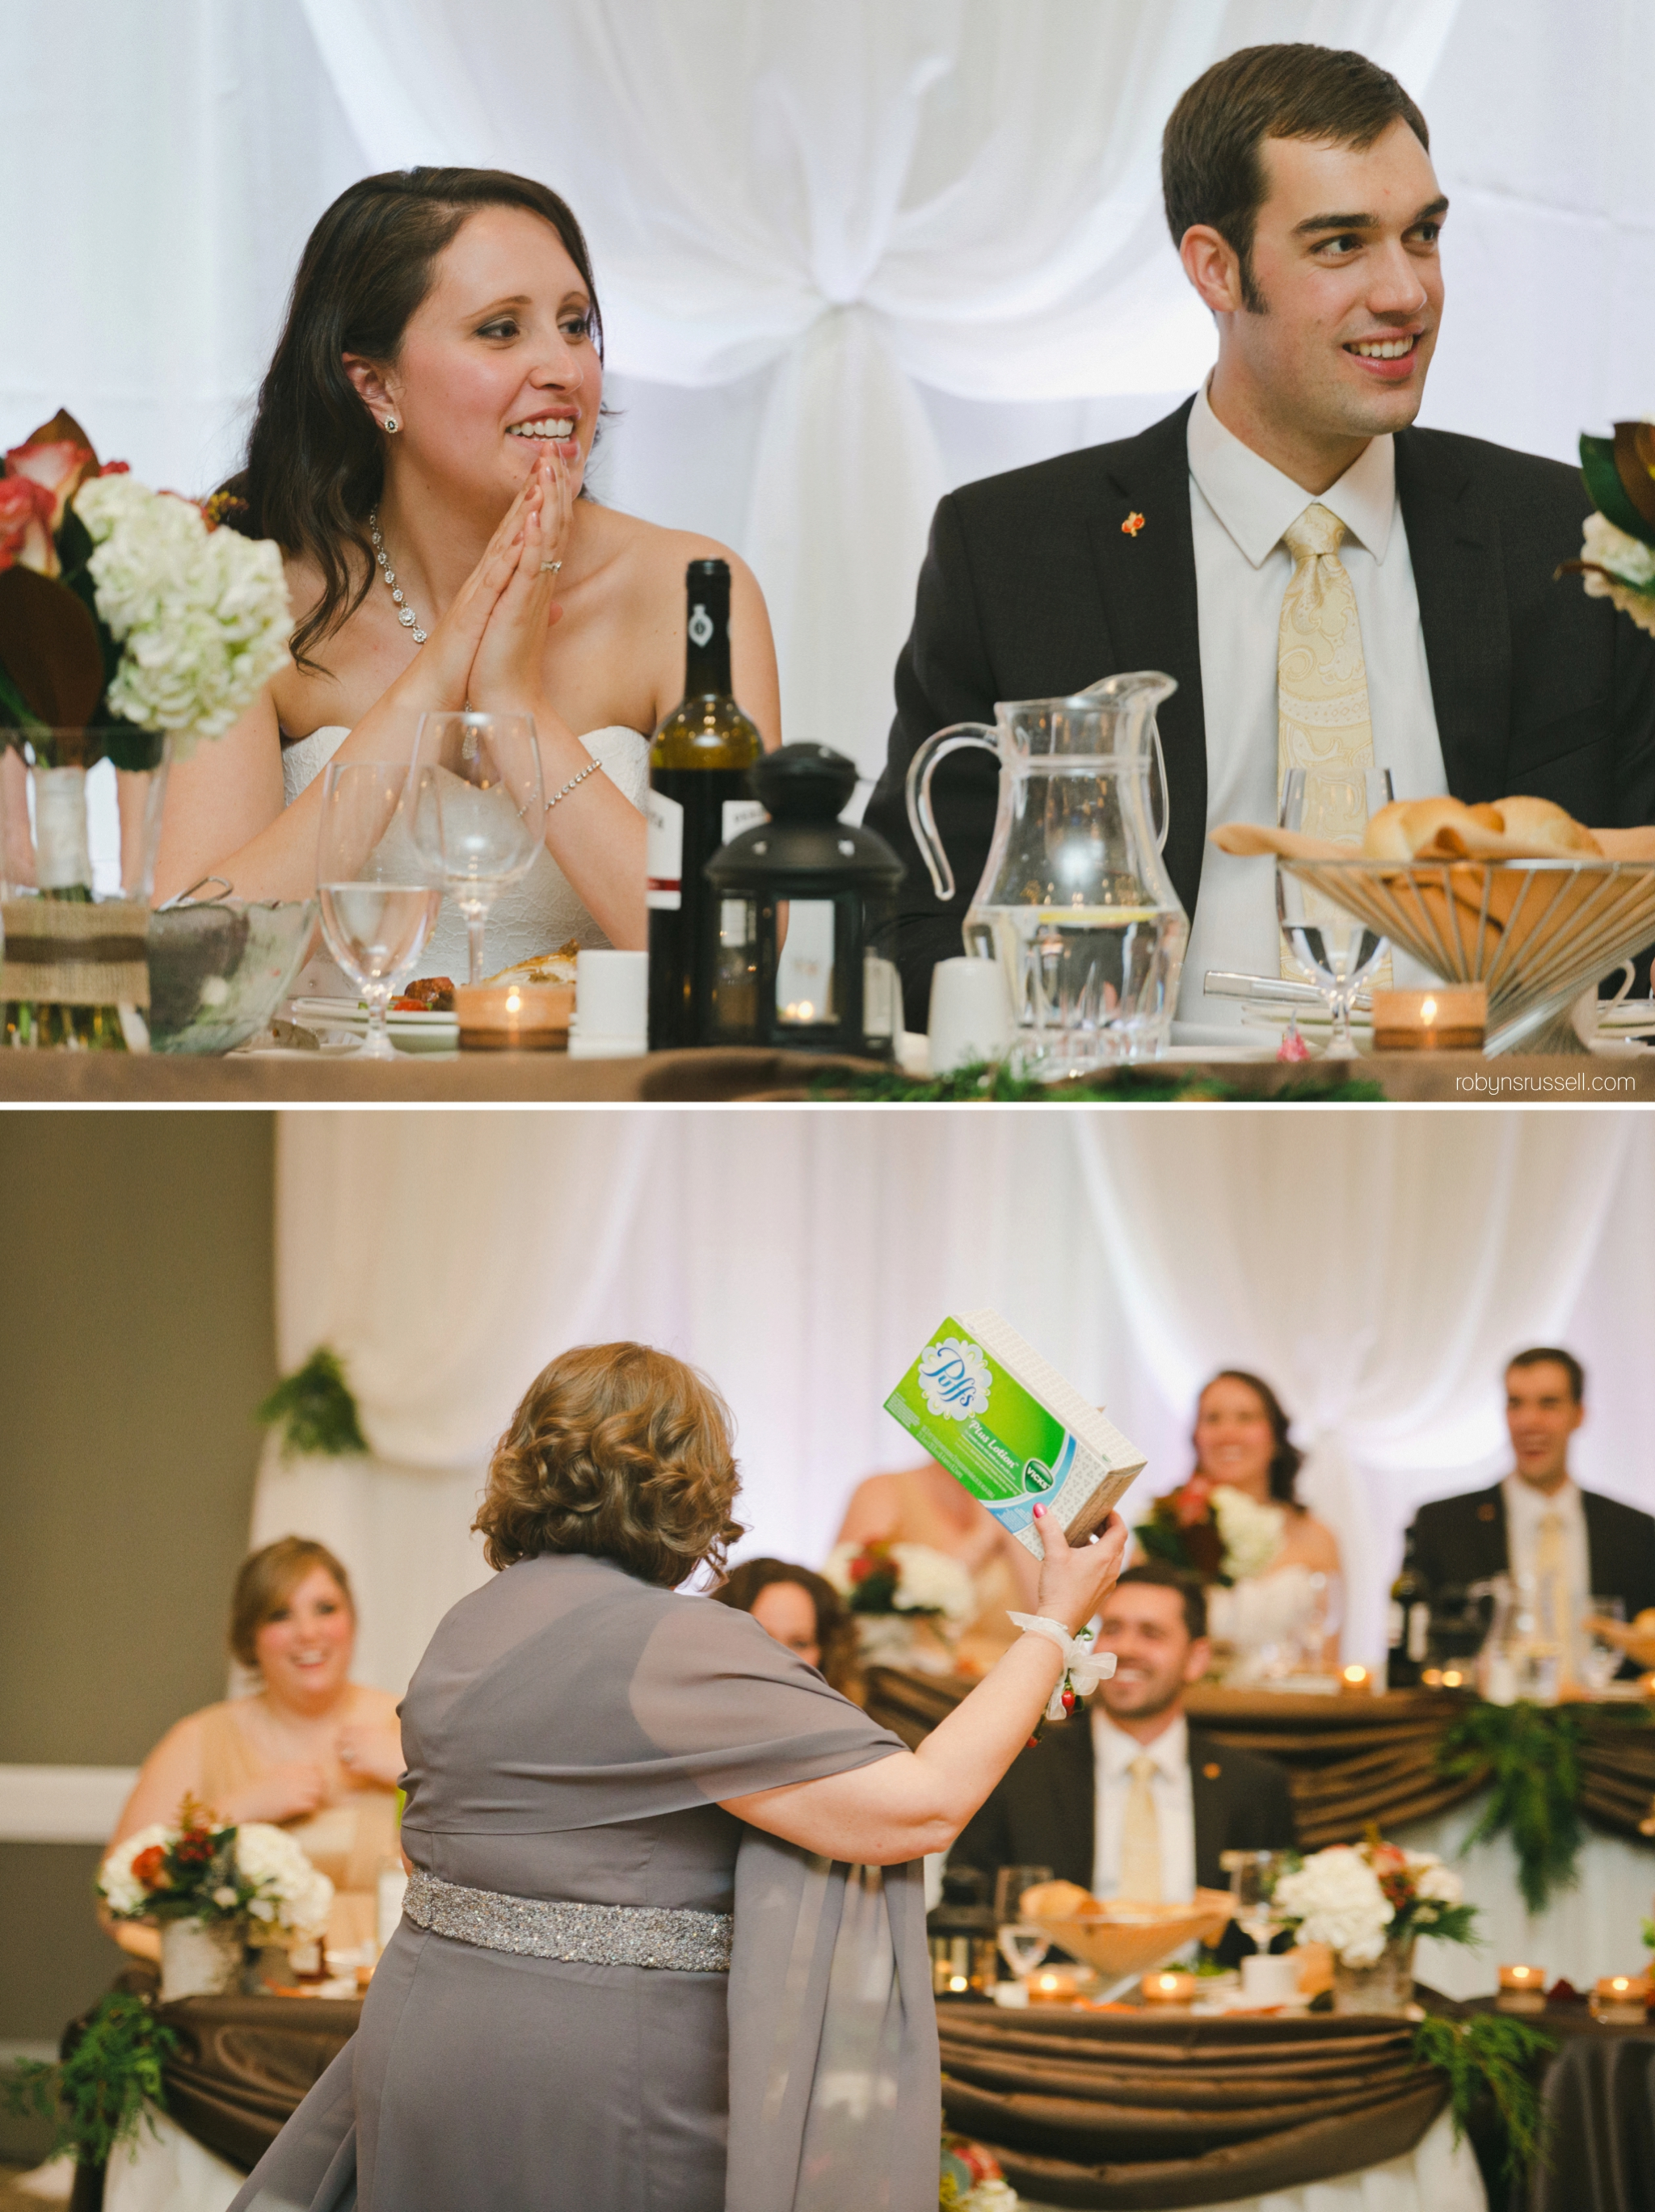 60-bride-and-groom-heartfelt-parent-speech.jpg